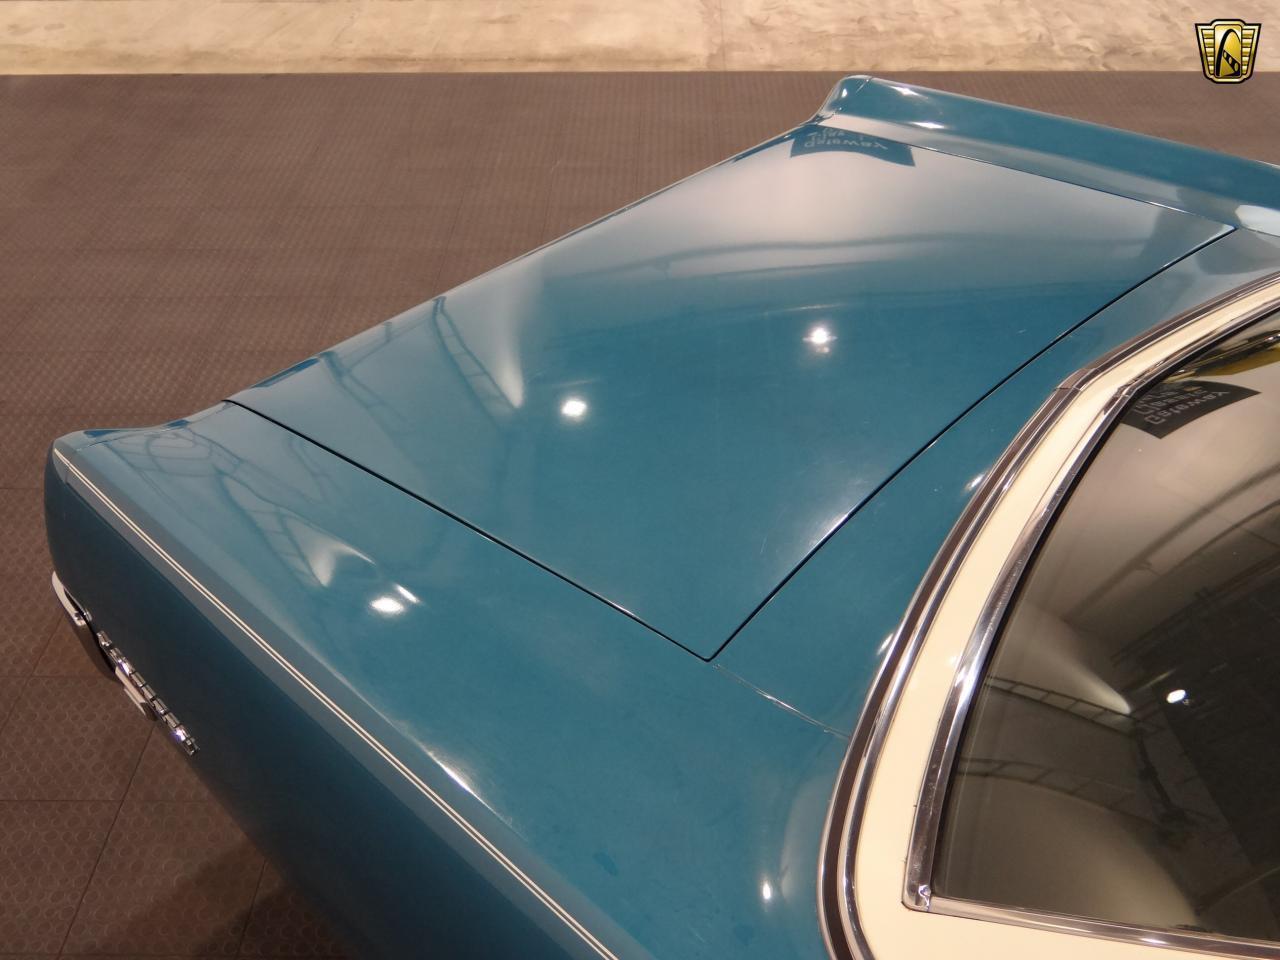 Large Picture of Classic 1969 Mercury Monterey located in Indianapolis Indiana - $17,995.00 - KECC